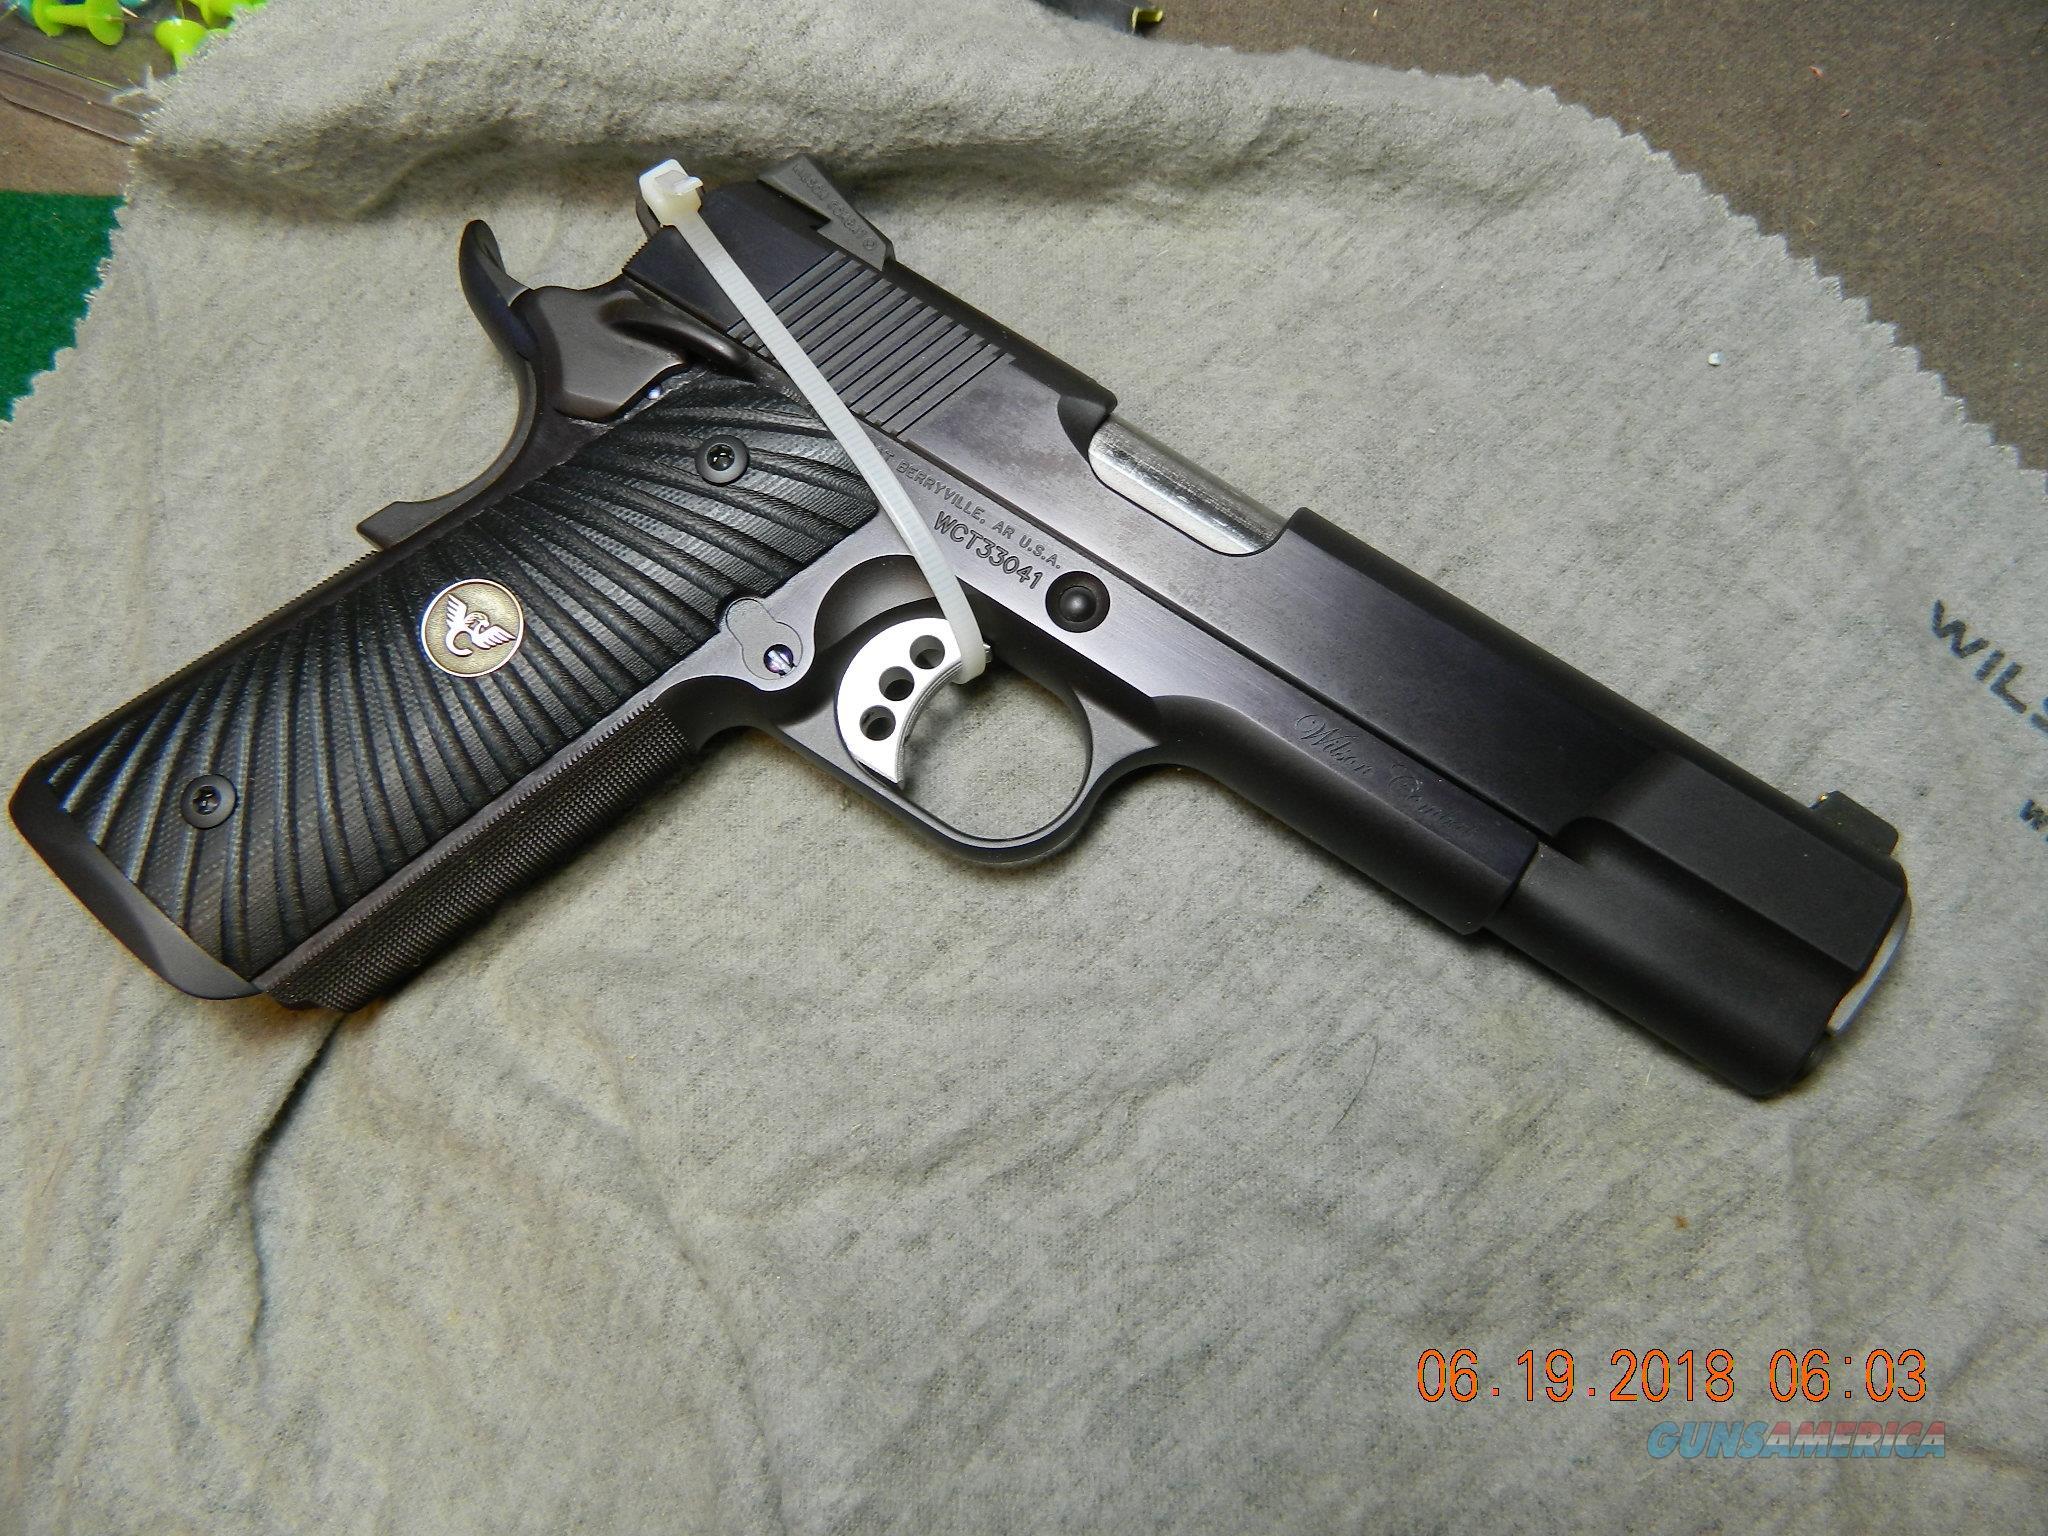 Wilson Combat CQB Elite 45 acp  Guns > Pistols > Wilson Combat Pistols